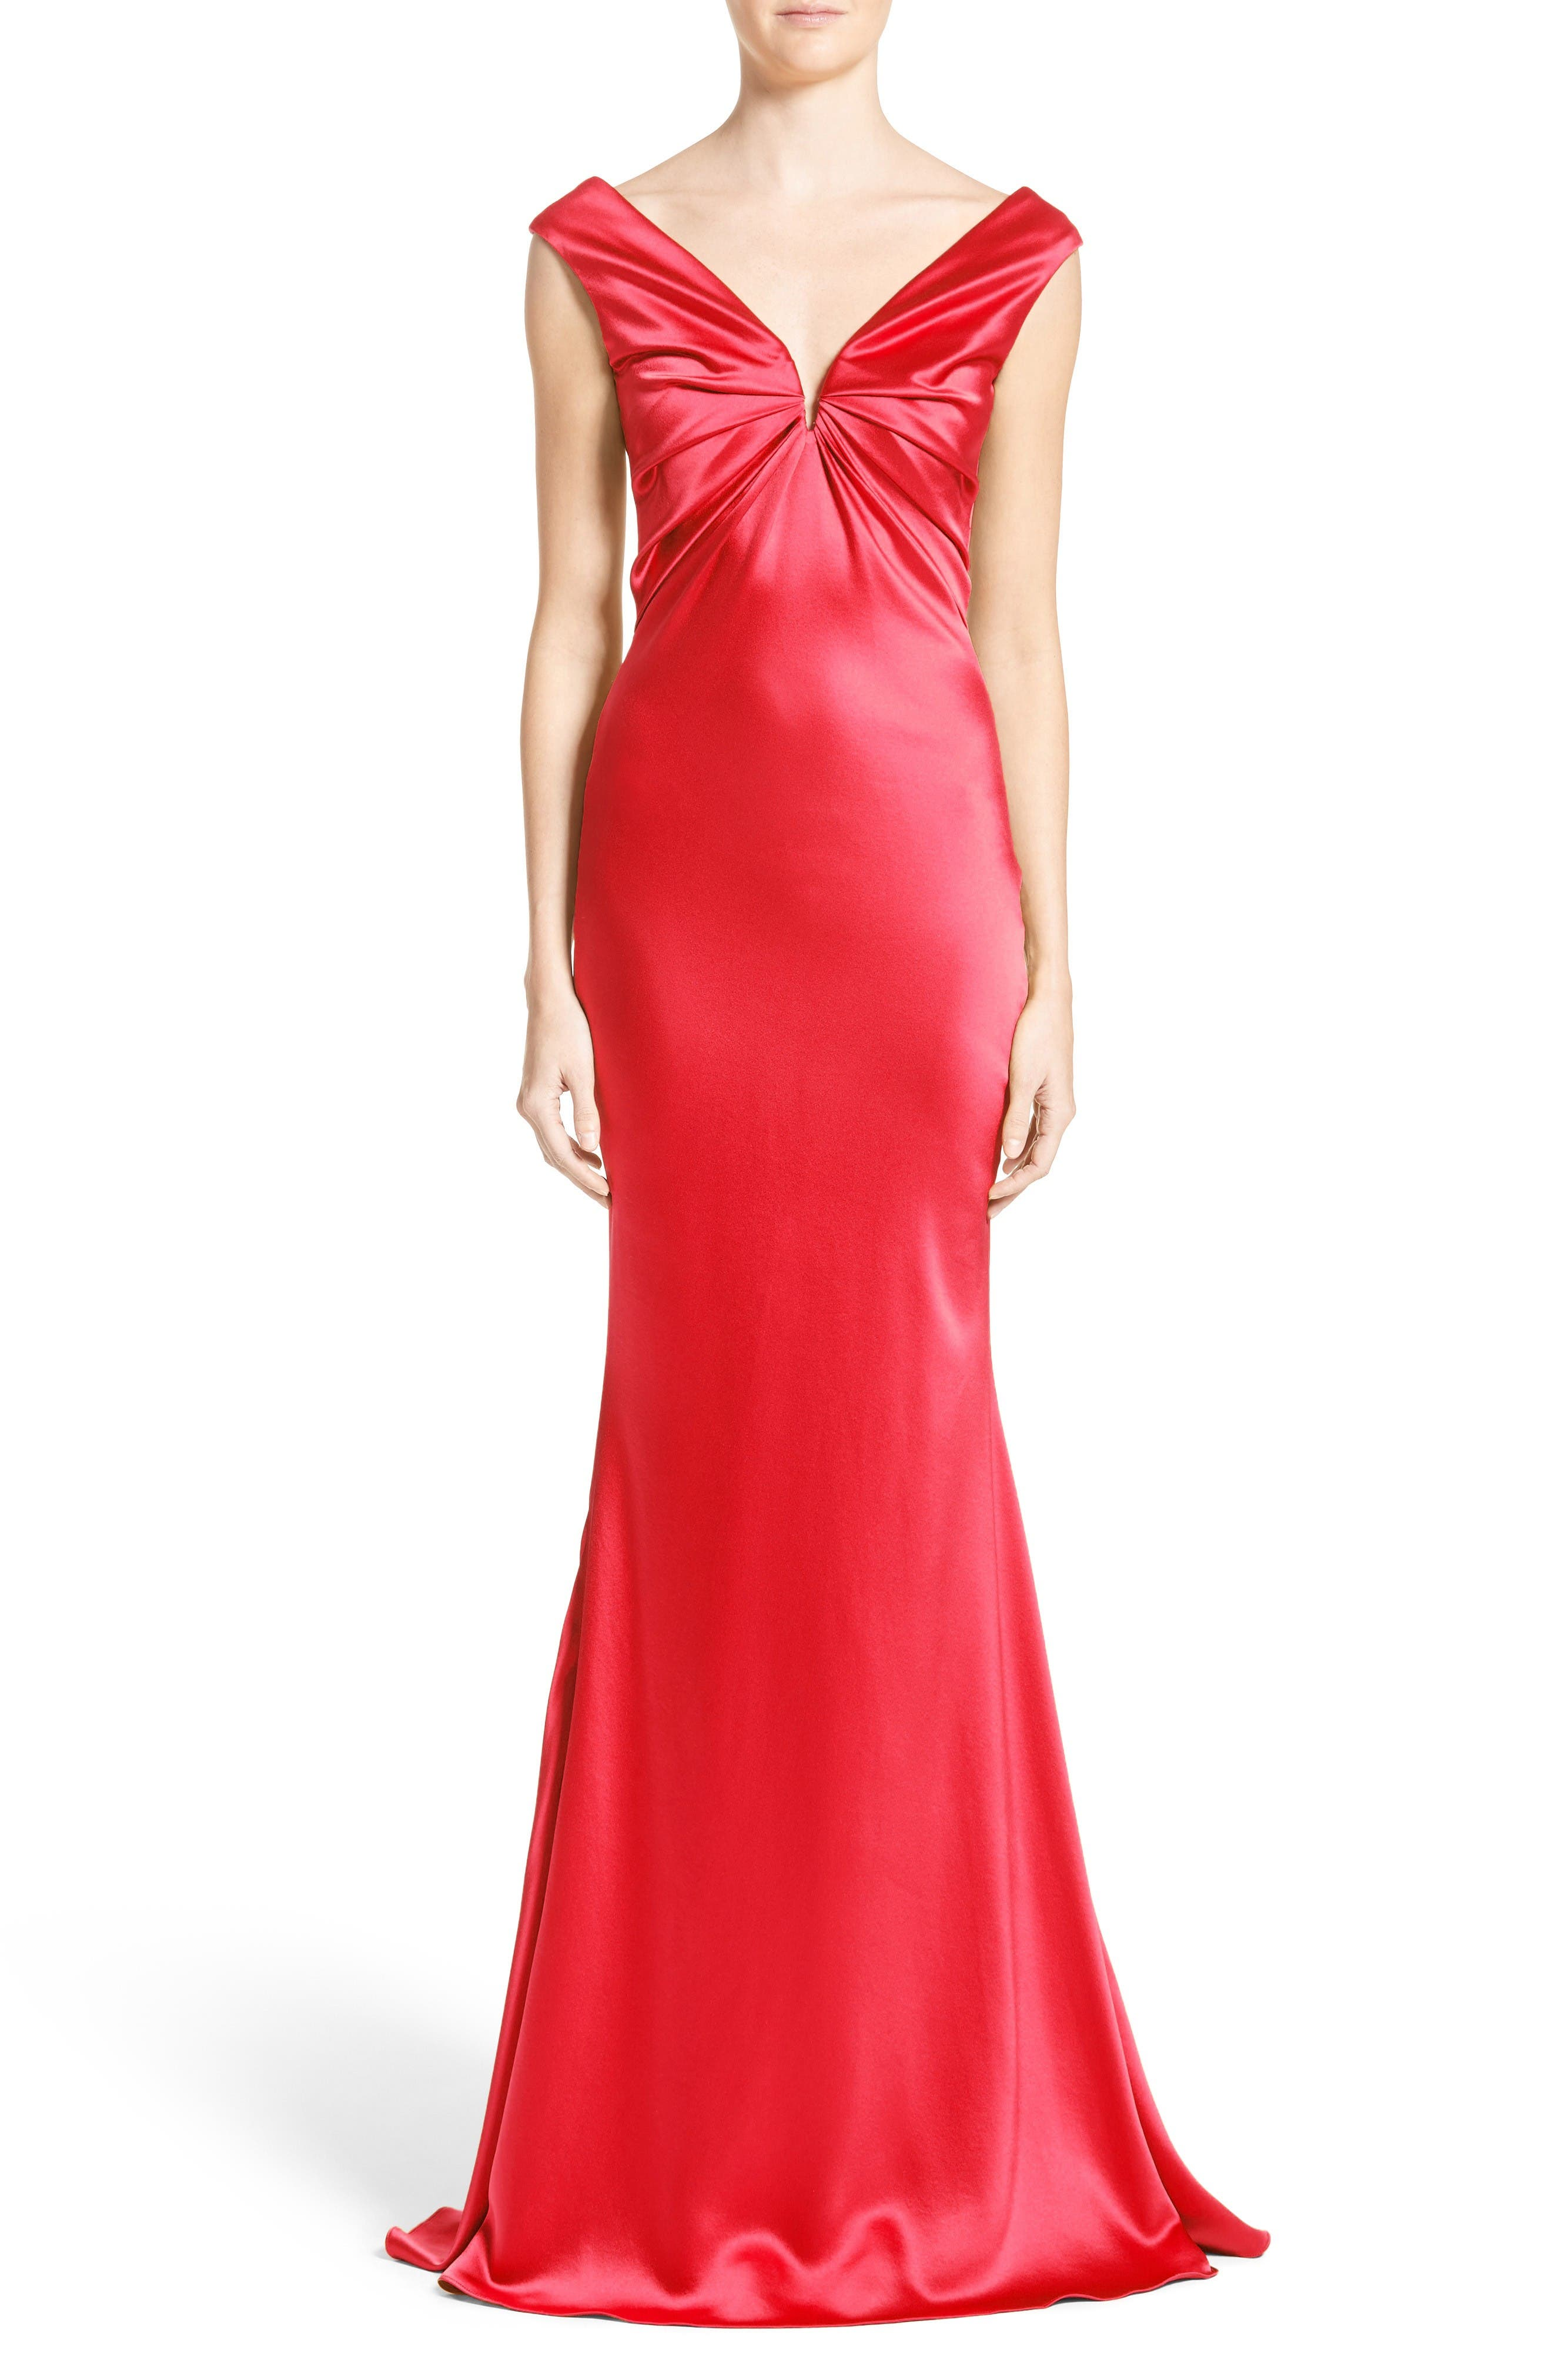 Alternate Image 1 Selected - Carolina Herrera Silk Satin Gown (Nordstrom Exclusive)